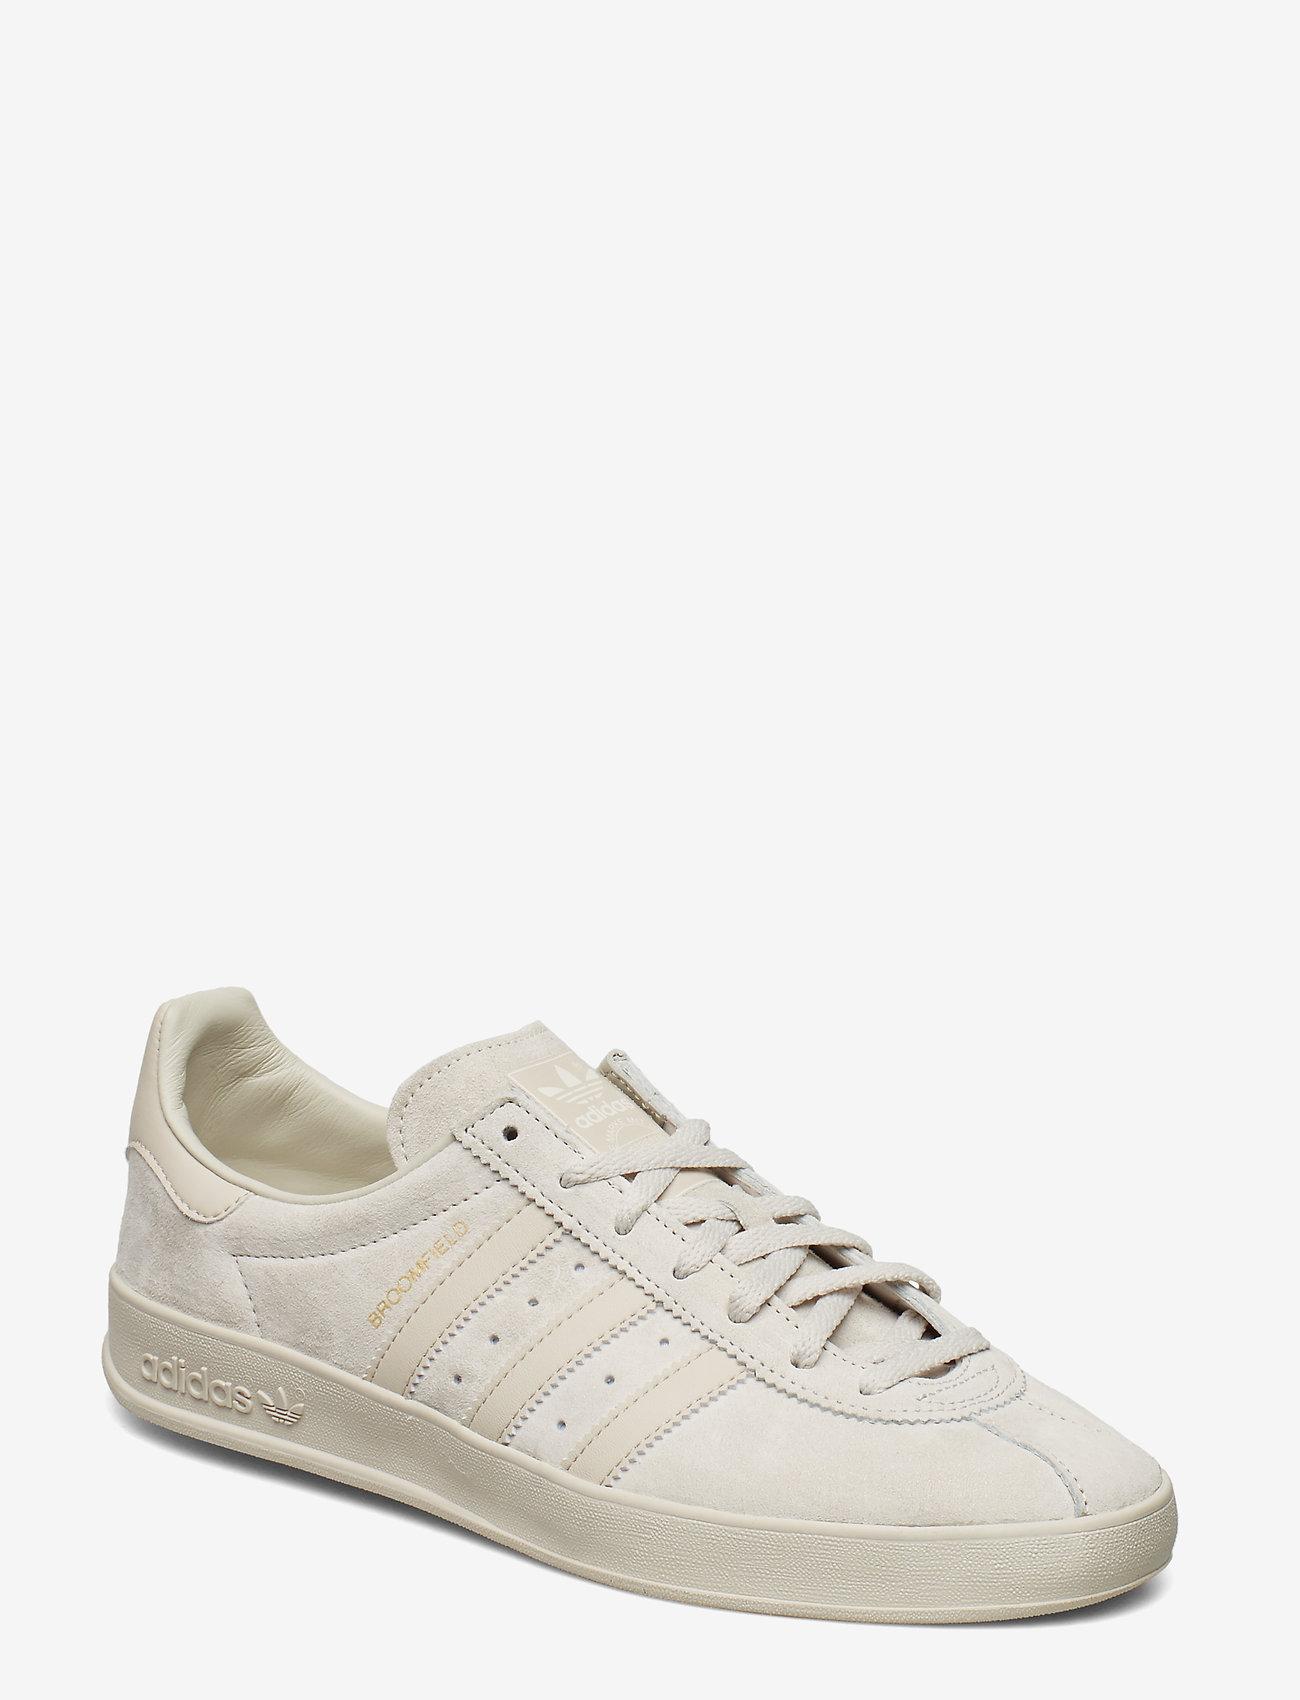 adidas Originals - BROOMFIELD - lav ankel - rawwht/cbrown/goldmt - 0